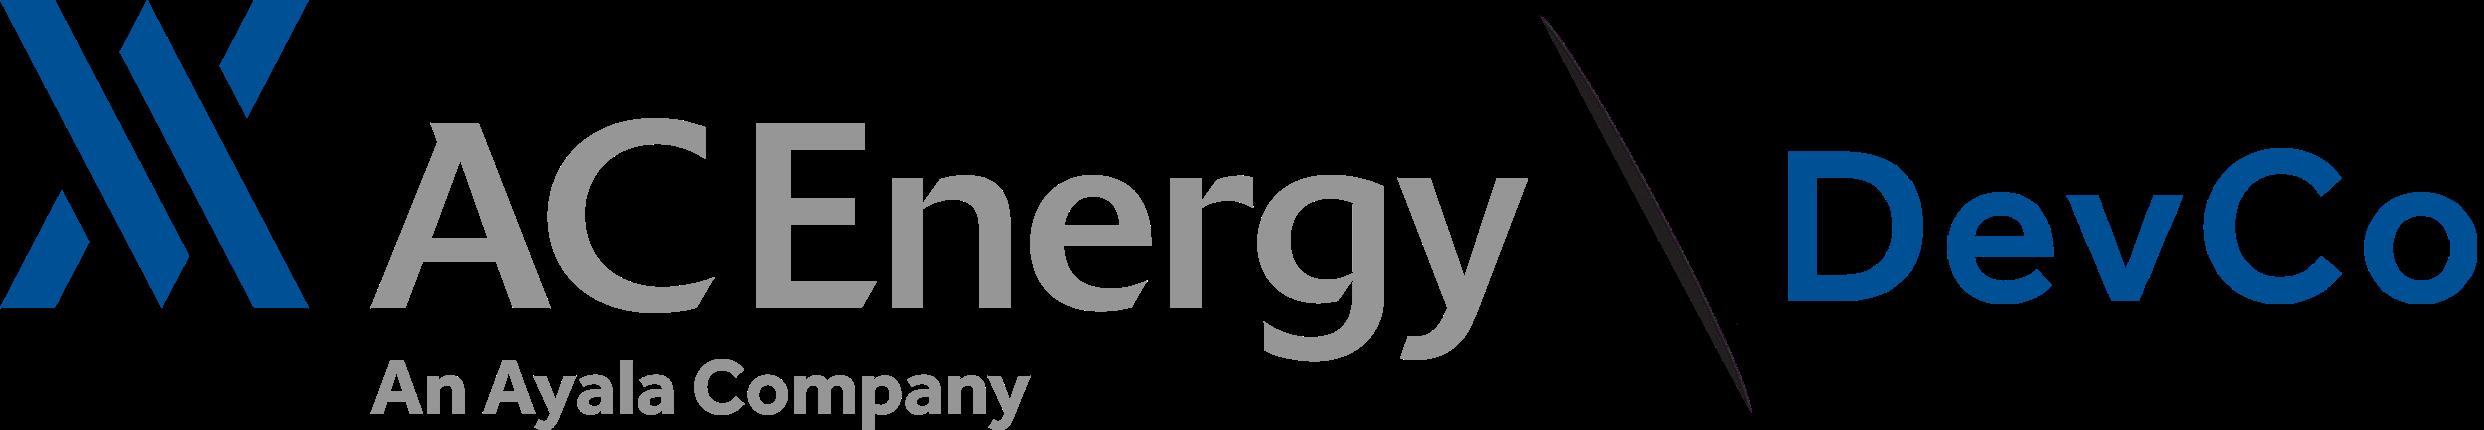 AC Energy Dev. Co.